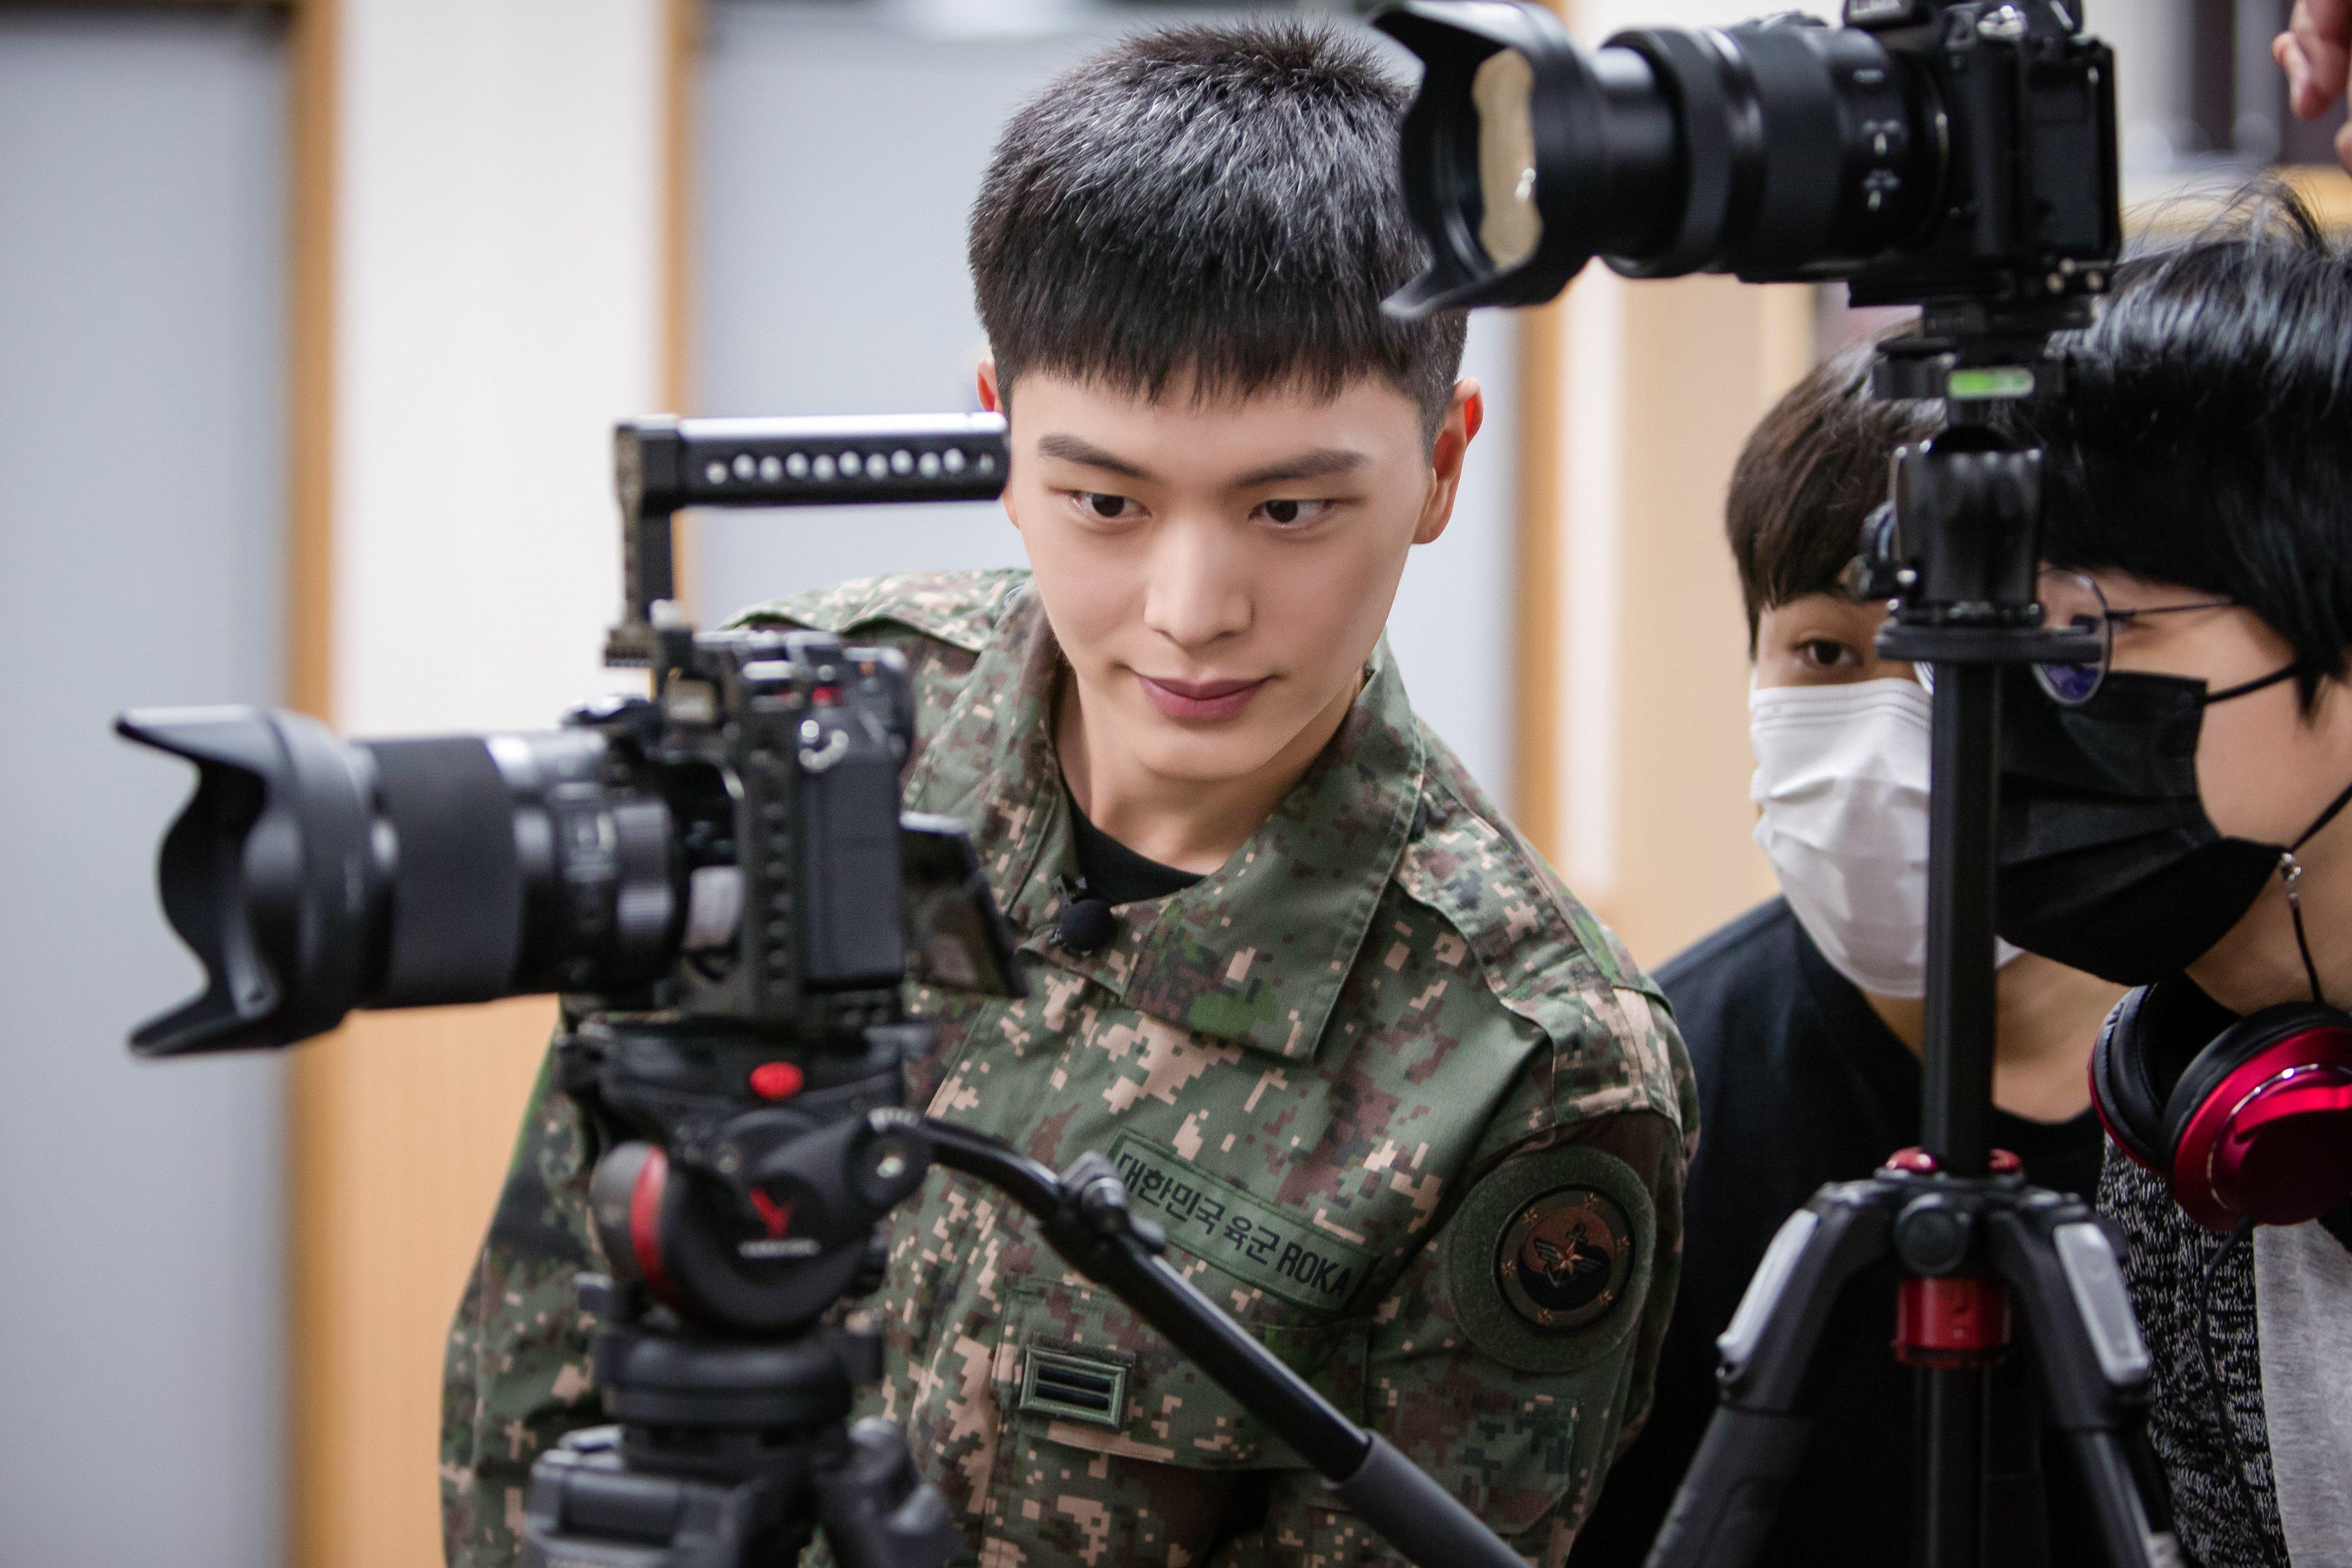 yook sungjae - Militer Ungkap Foto Baru D.O. EXO Dan Yook Sungjae BTOB